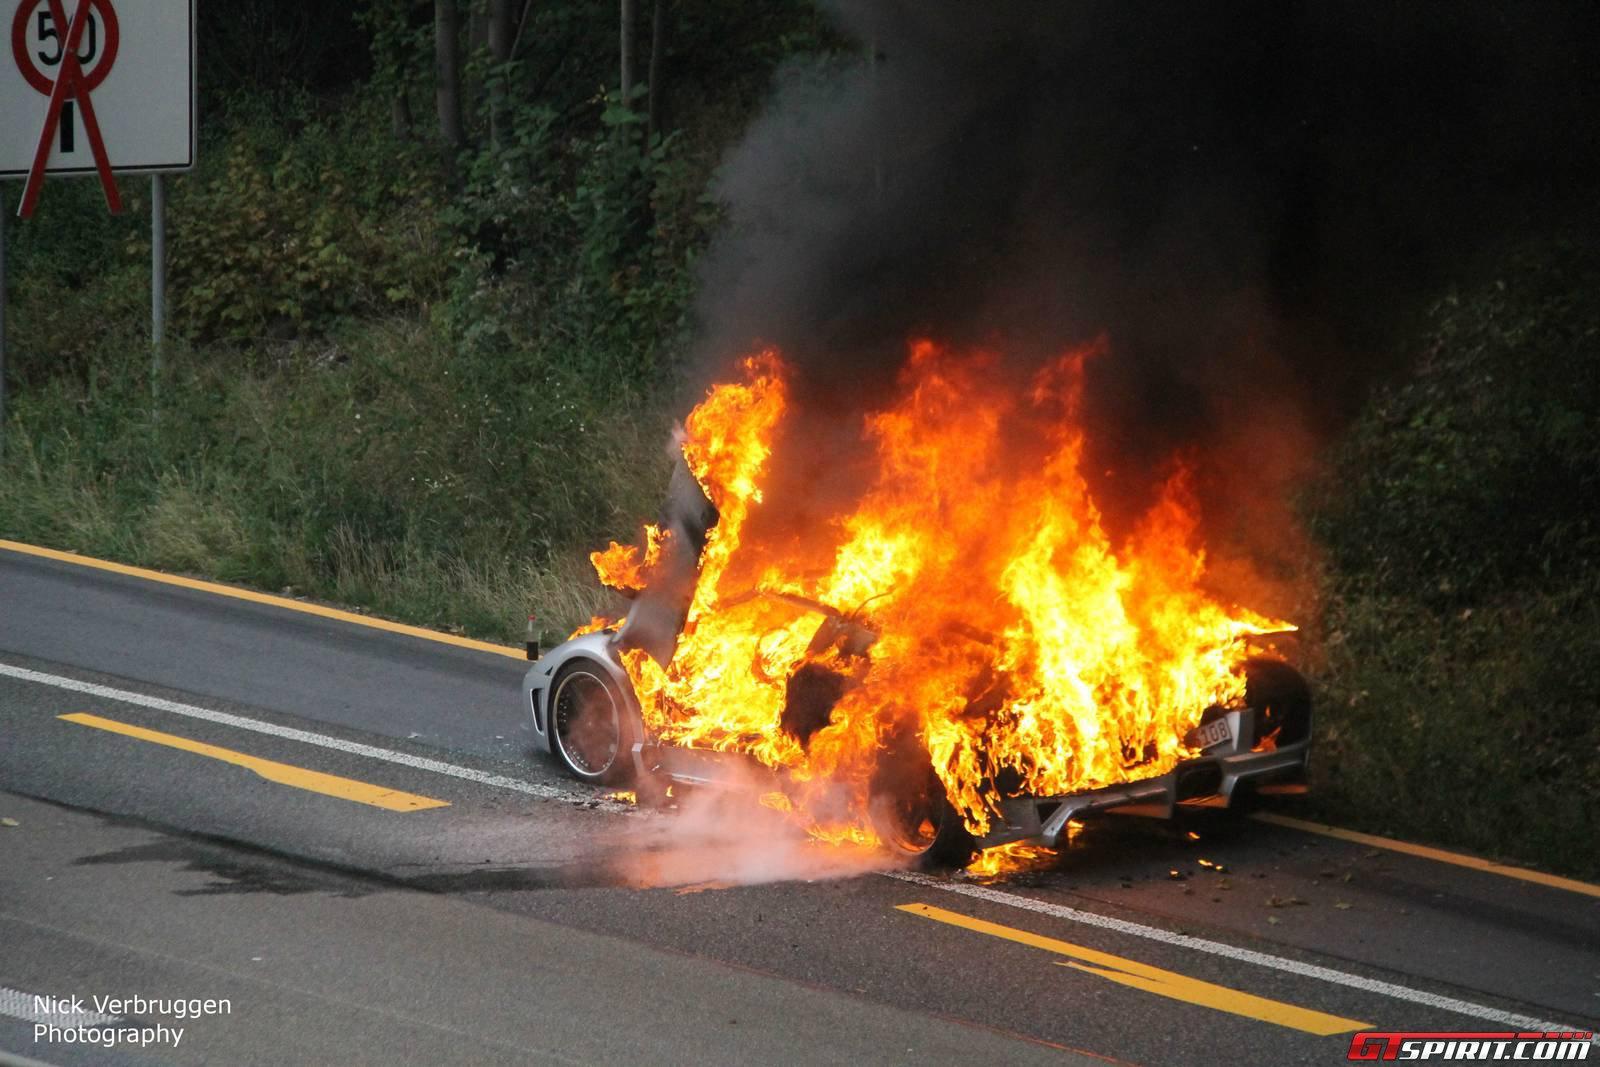 Lamborghini Murcielago Reduced To Ashes In Less Than 15